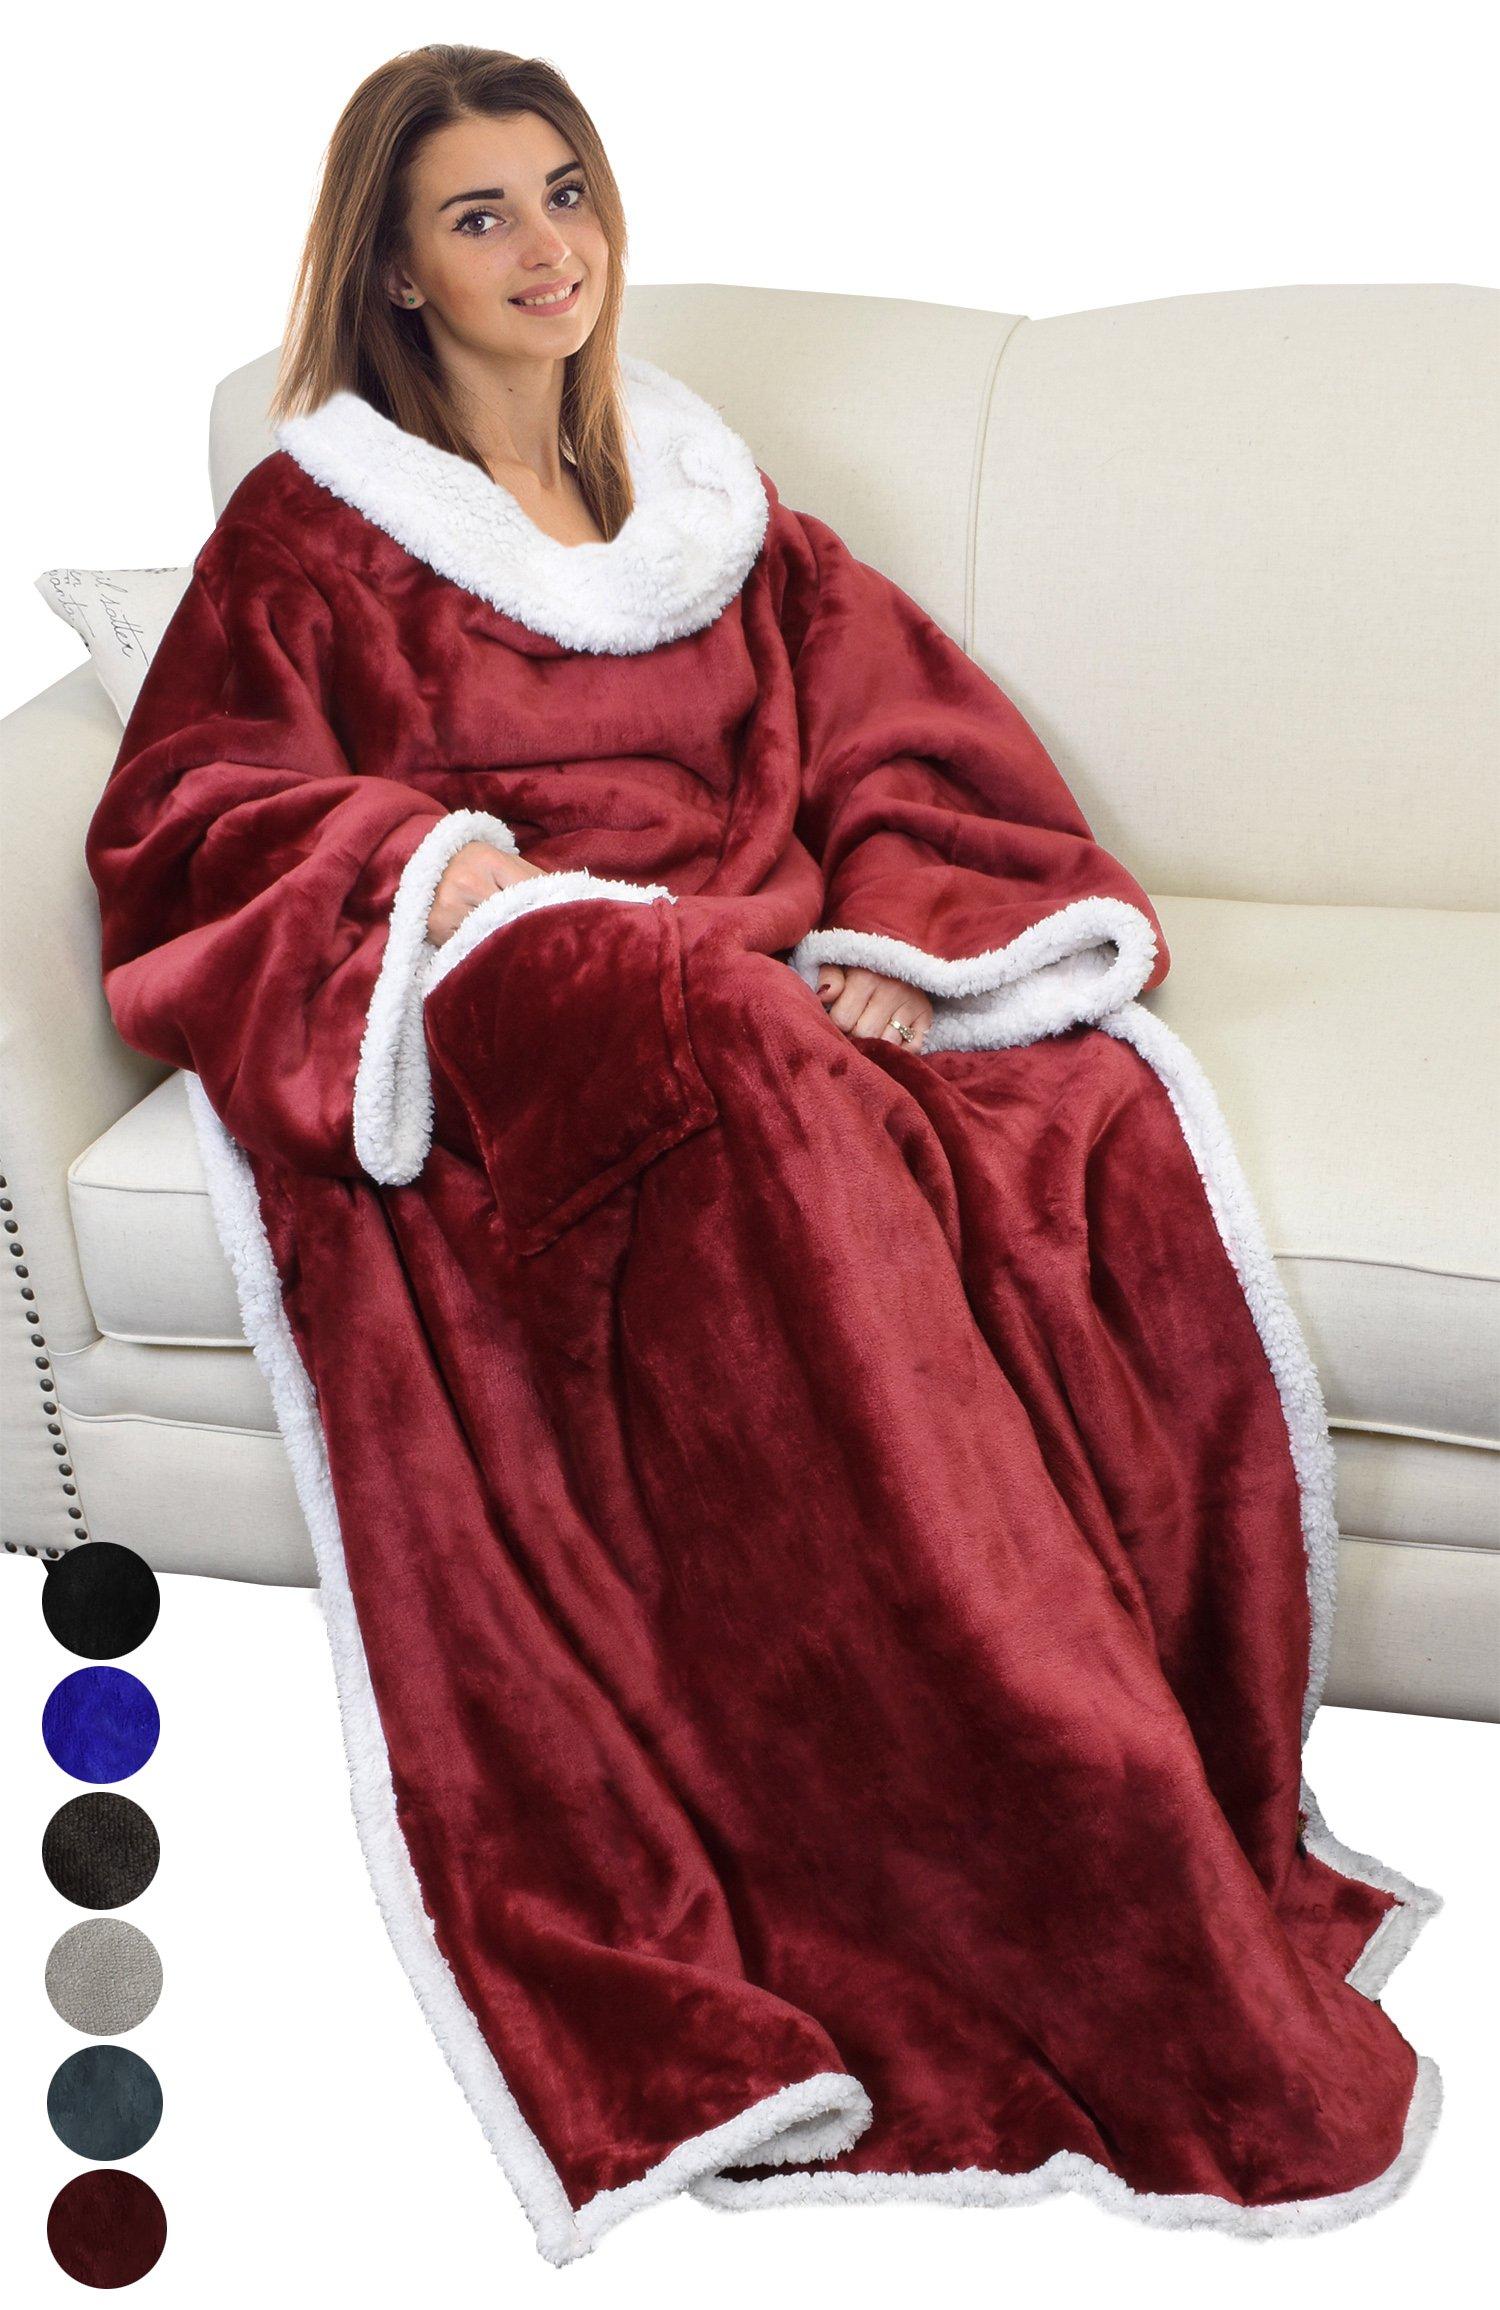 Catalonia Platinum Blanket with Sleeves, Dual Microplush Fleece Sherpa Warm Blankets for Adult Women Men 183cm x 140cm, Wine